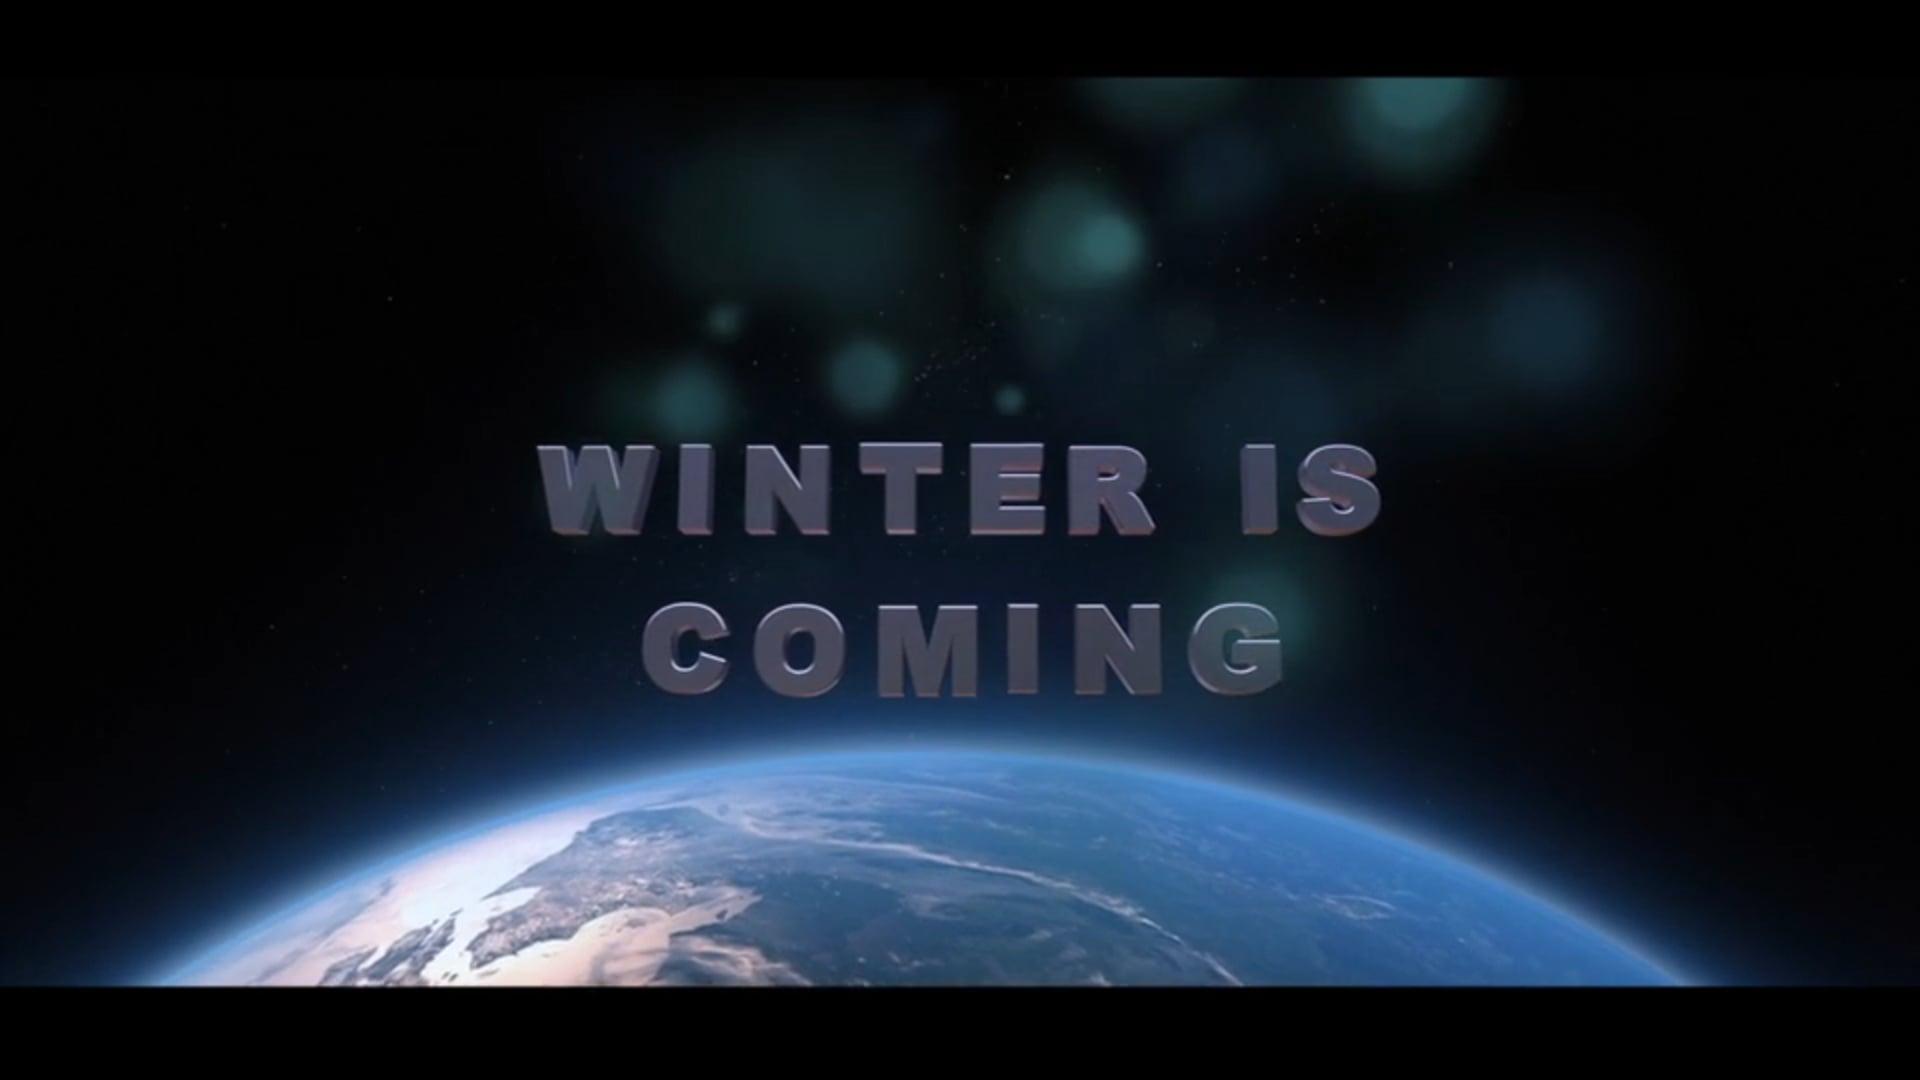 WinterTour (Winter is coming)